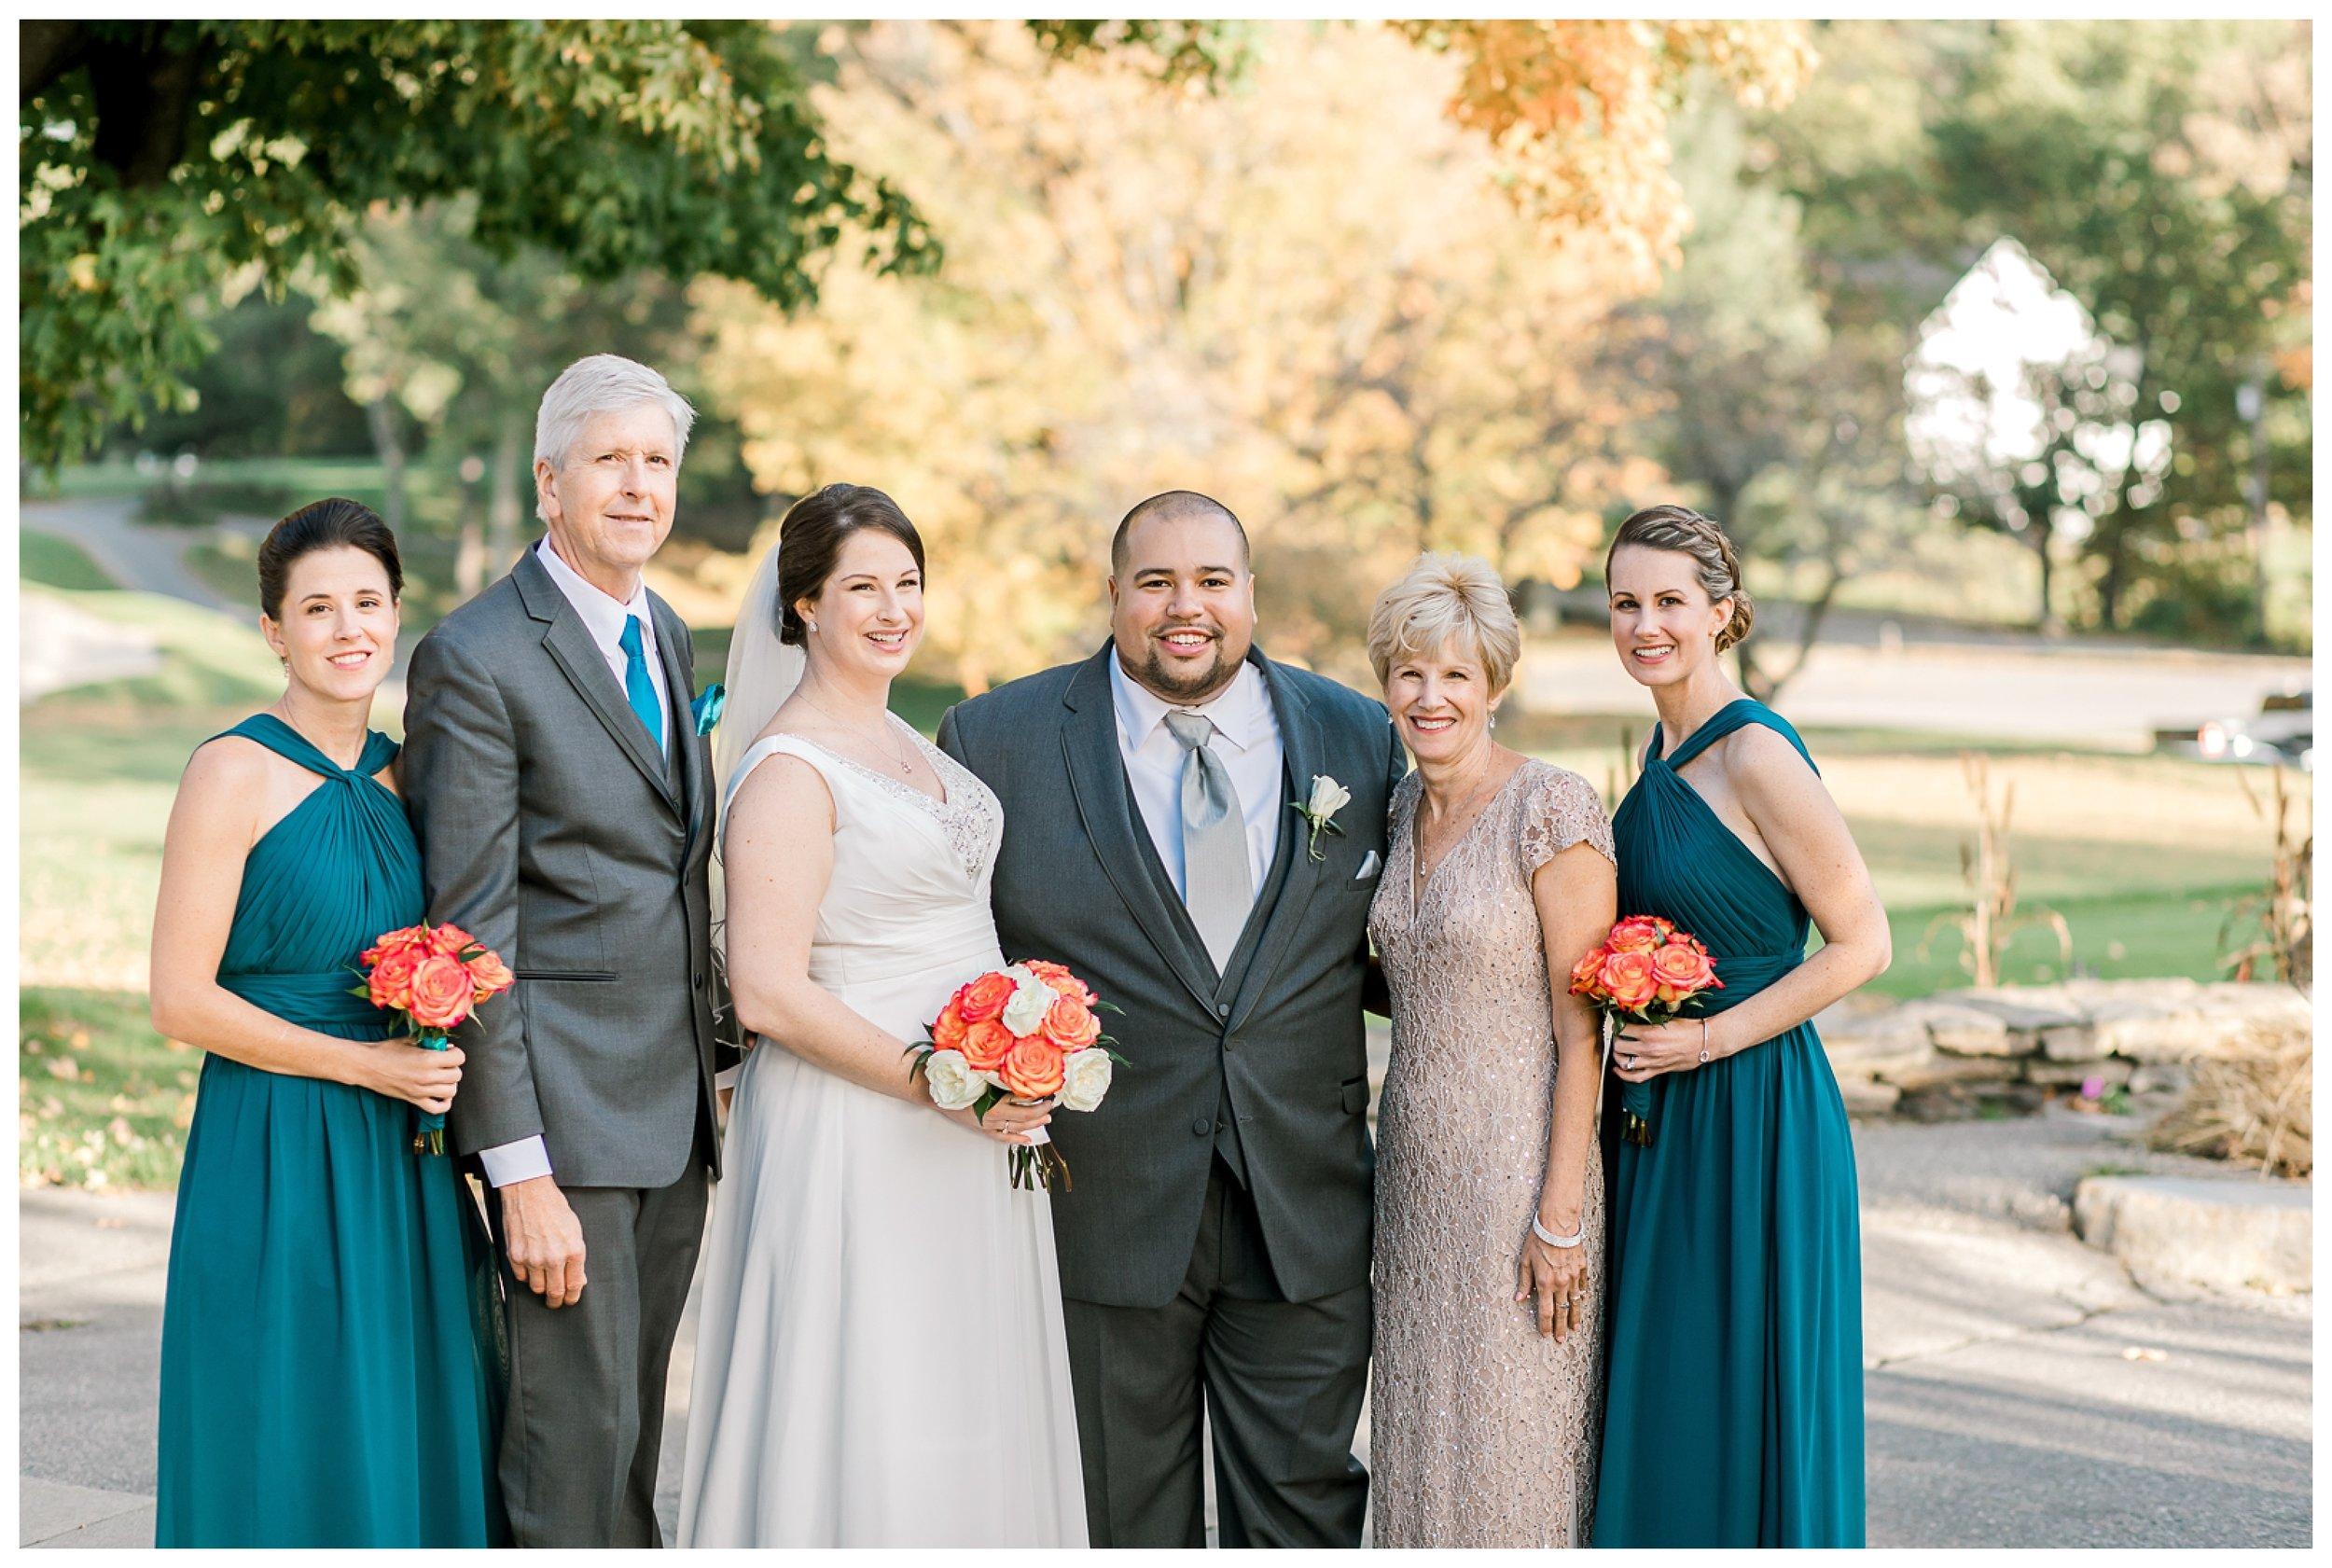 pleasant_valley_country_club_wedding_sutton_erica_pezente_photography (38).jpg